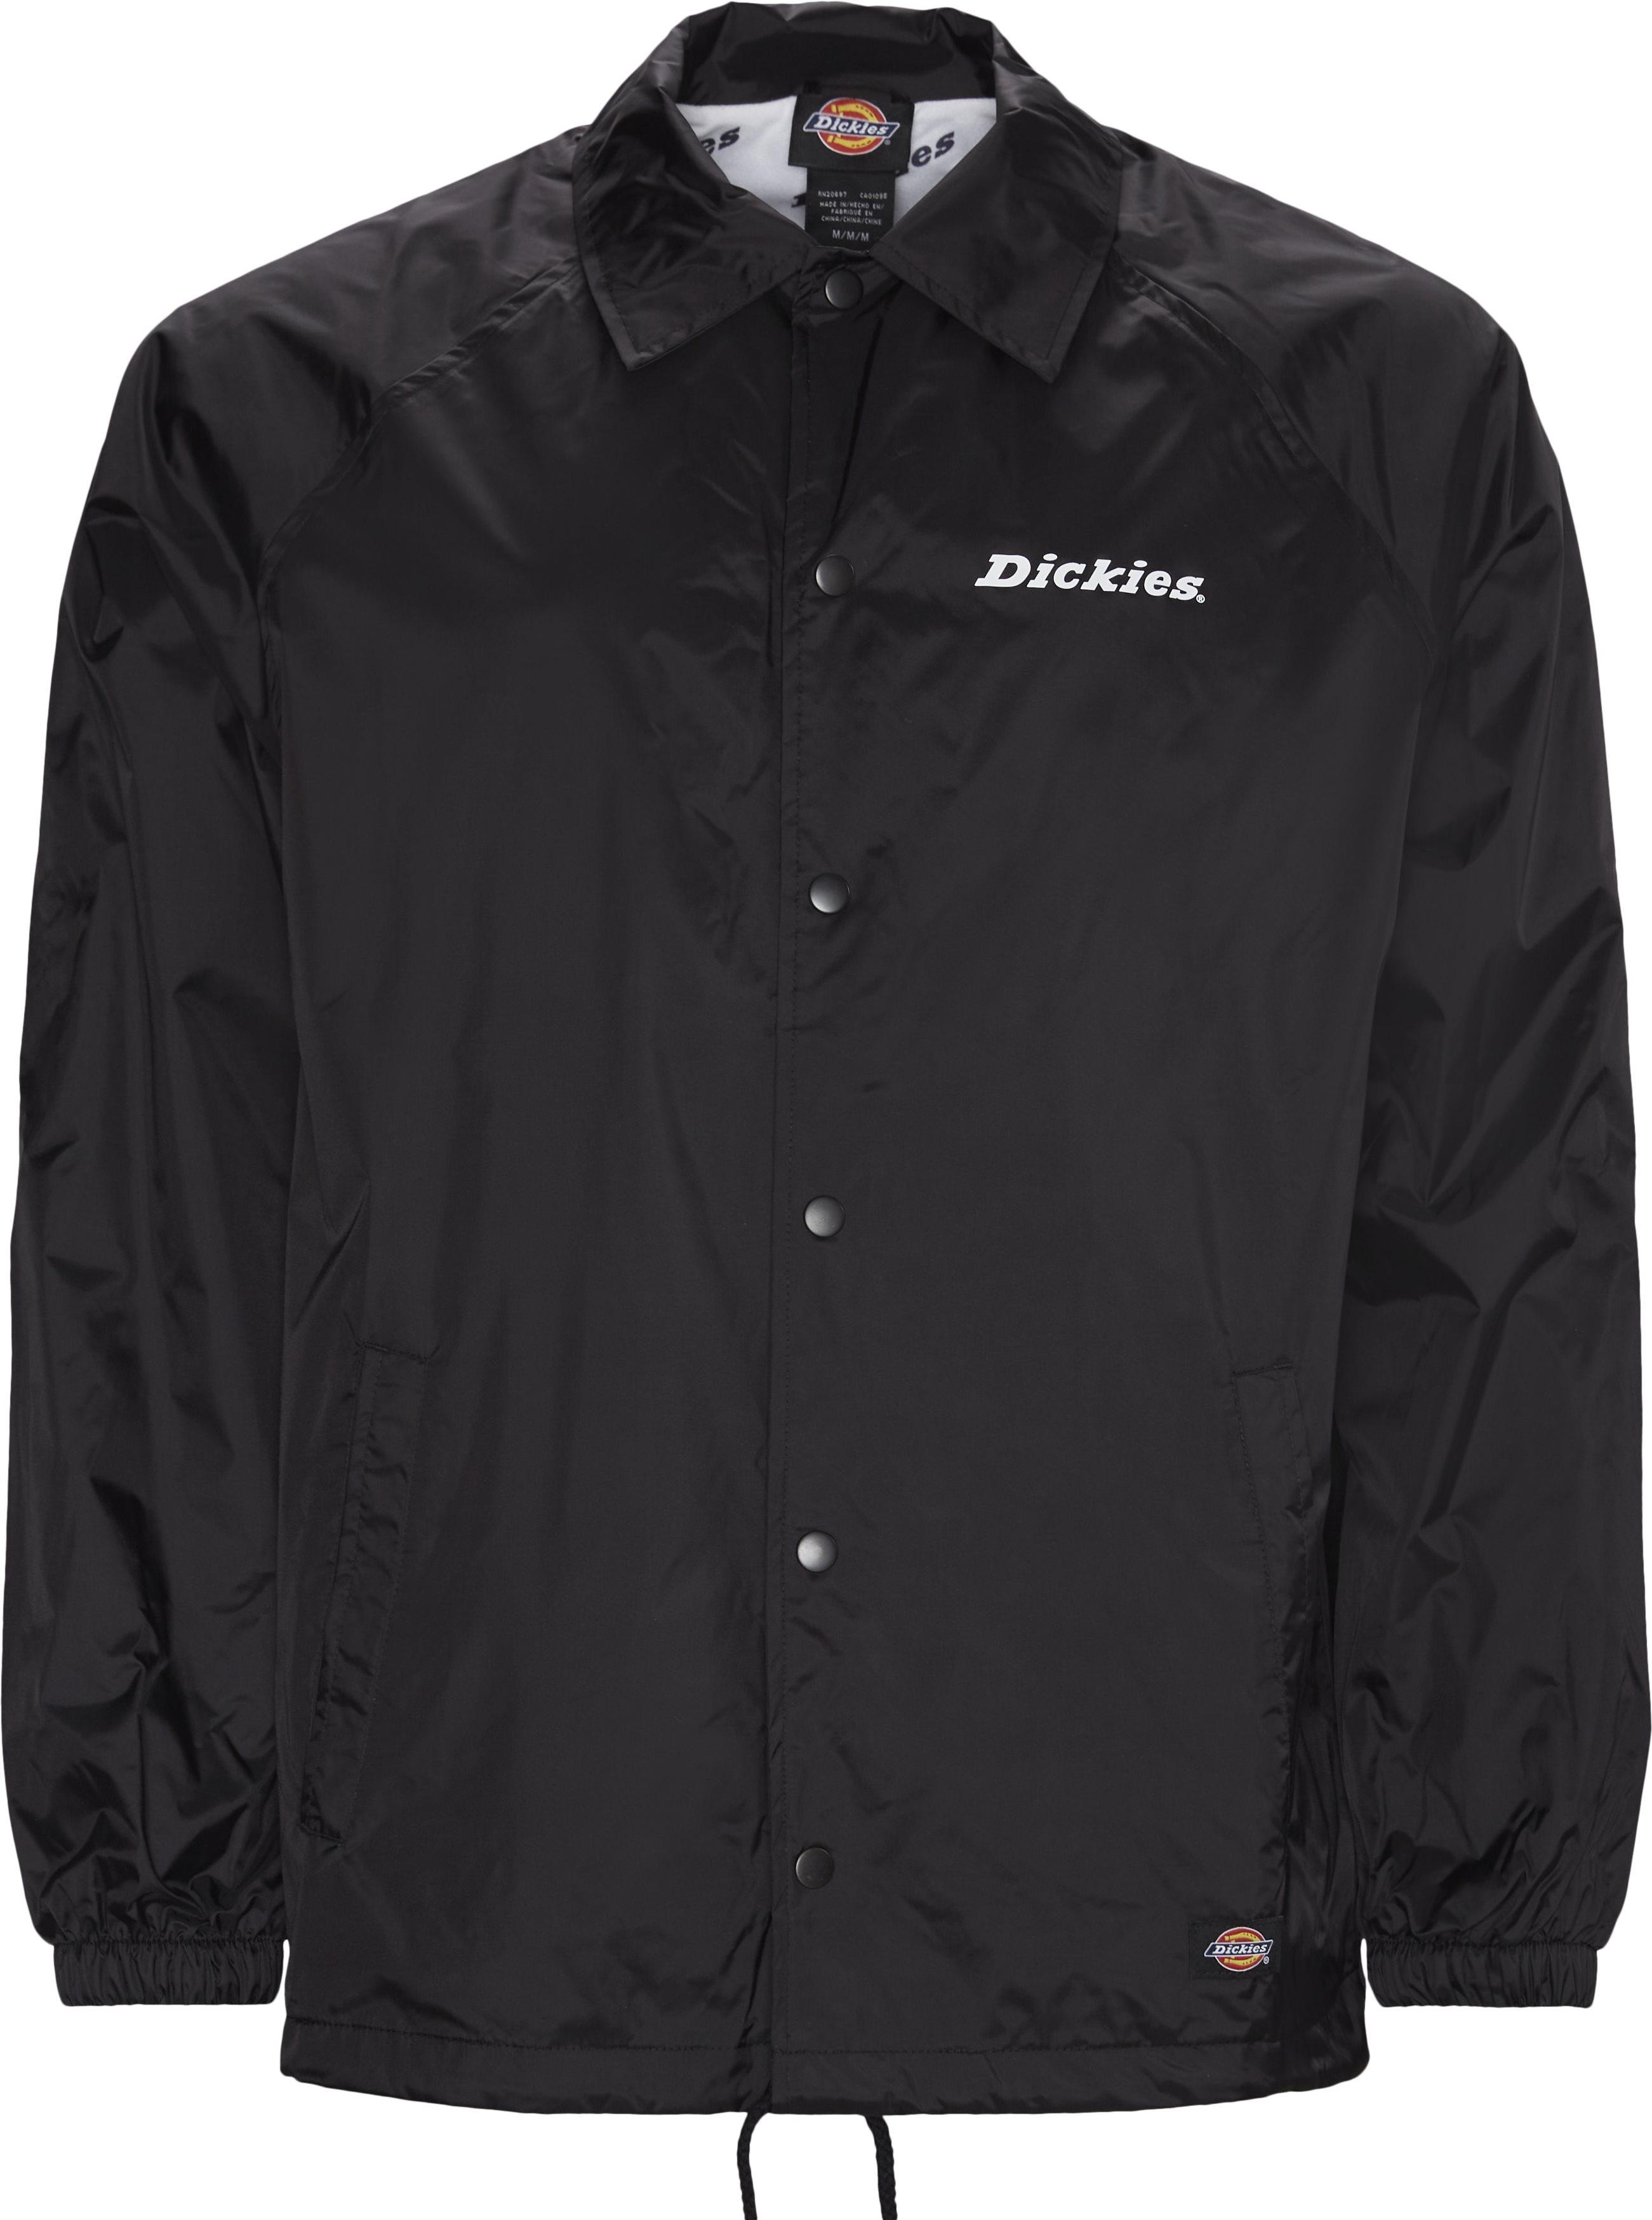 Nylon Coach Jacket - Jackets - Regular - Black